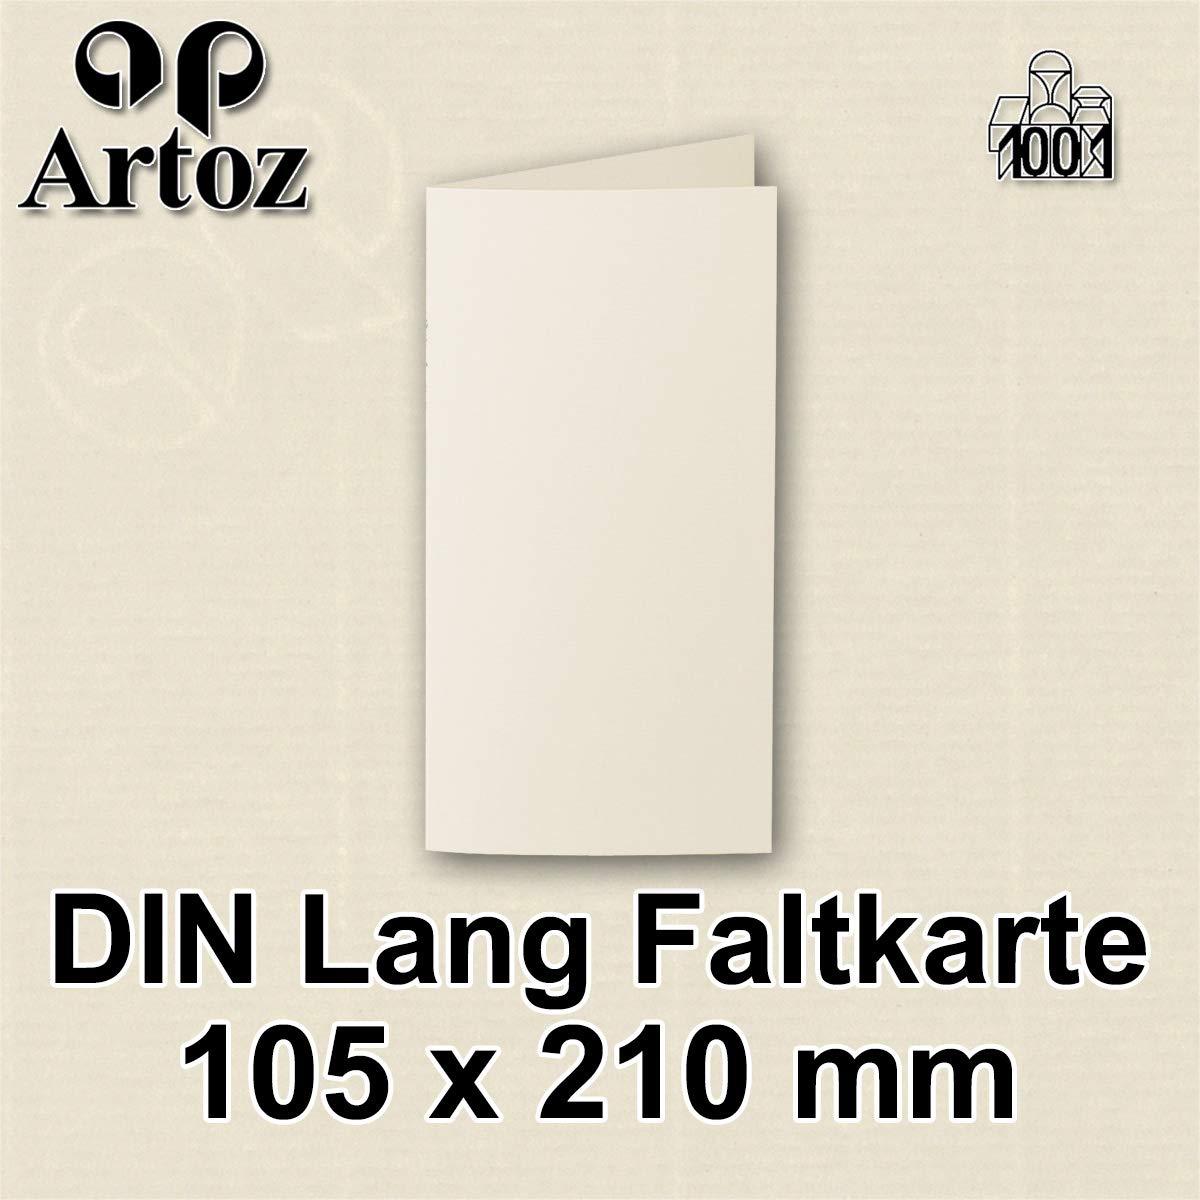 Creme Blanko Doppelkarte mit 220 g//m/² edle Egoutteur-Rippung ARTOZ 50x DIN Lang Faltkarten Chamois gerippt 210 x 105 mm Klappkarten